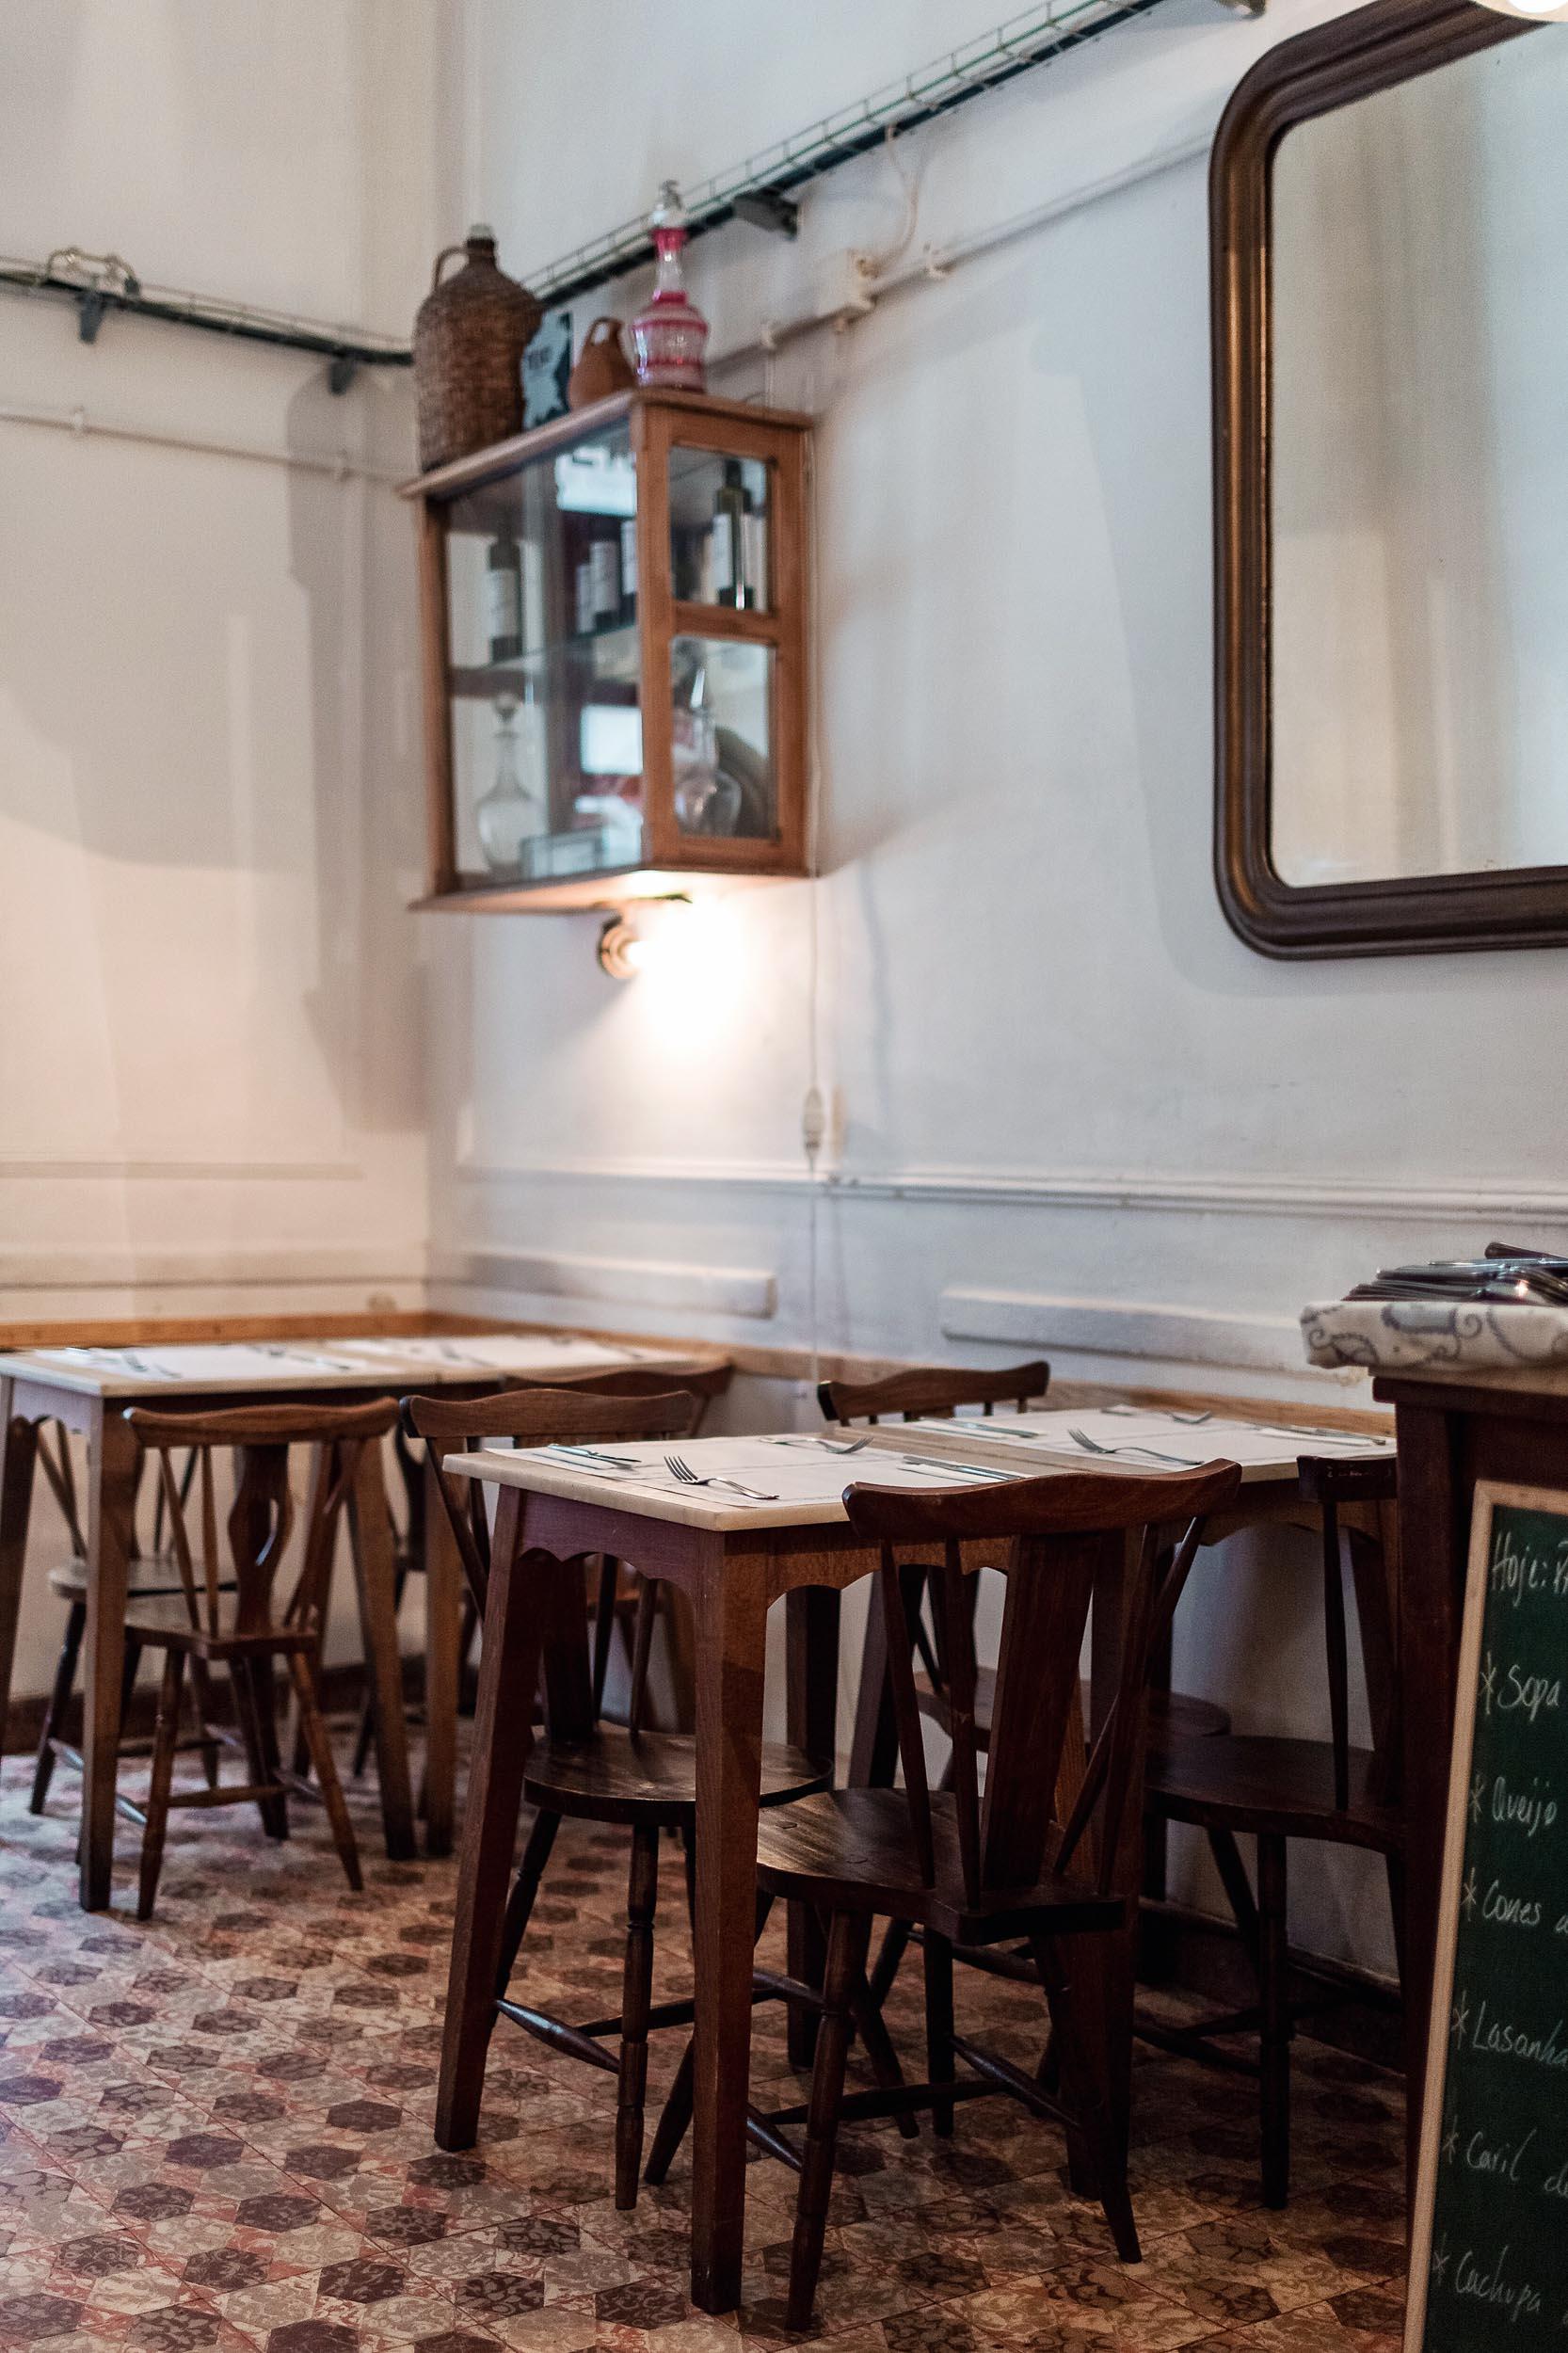 One of the best restaurants in Lisbon, Portugal: Taberna da Rua das Flores